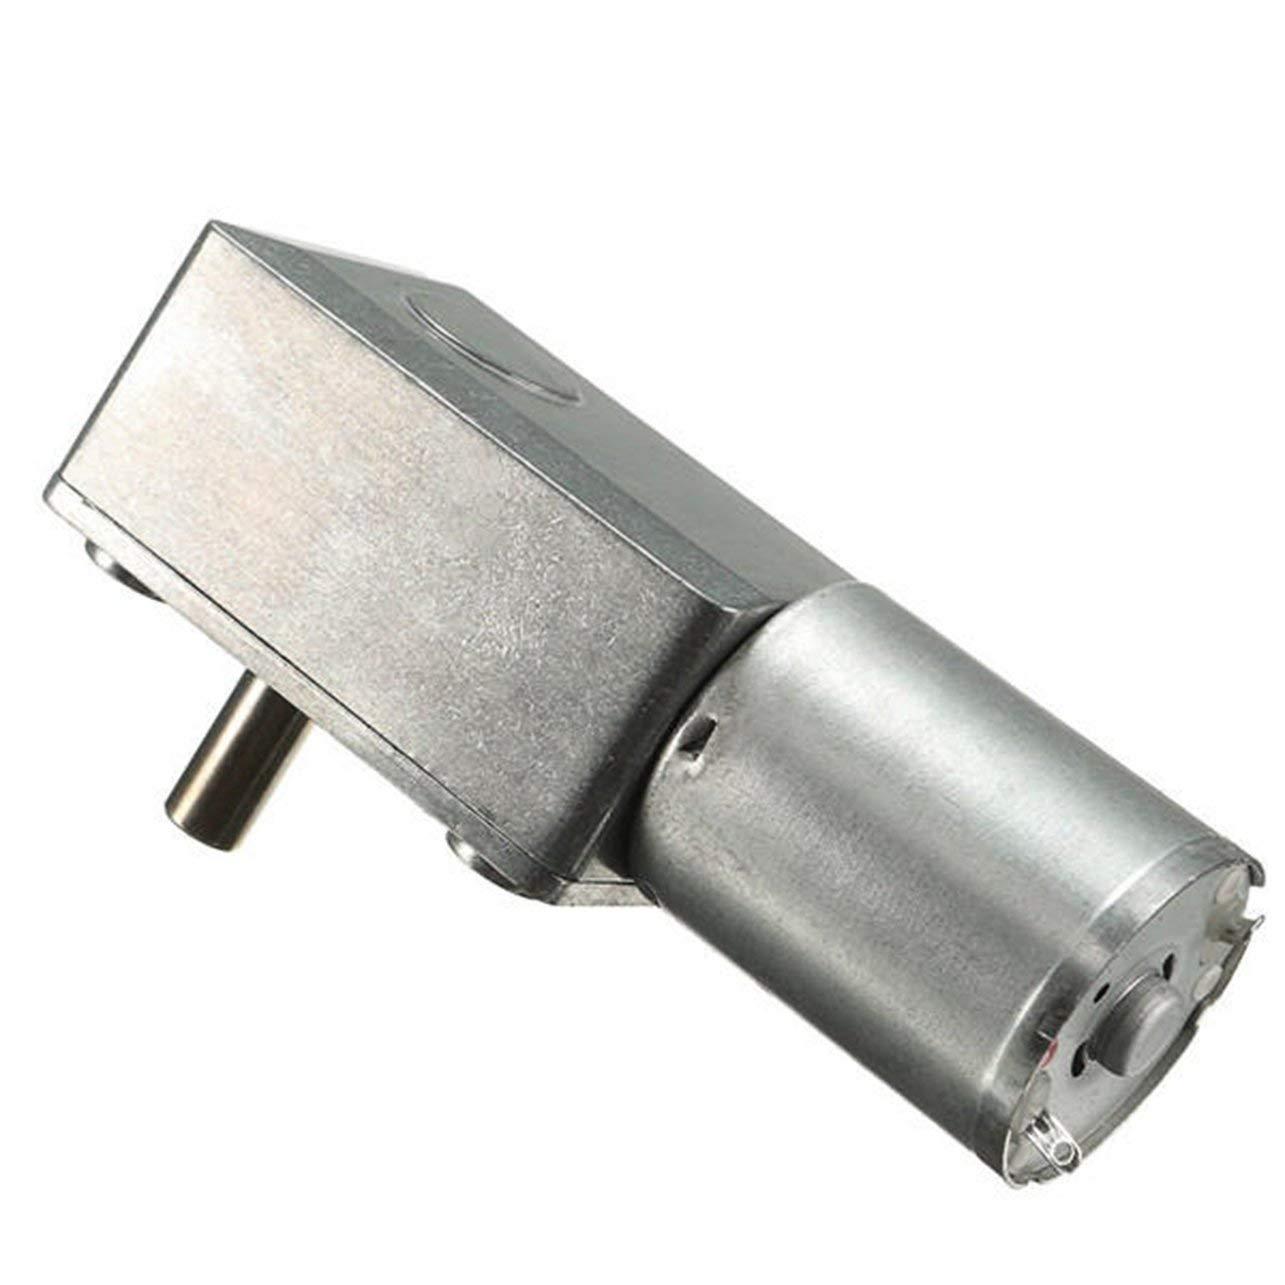 WOSOSYEYO DC 12V 0.6rpm Reversible High Torque Turbo Worm Gear Motor GW370 DC Reductor Motor